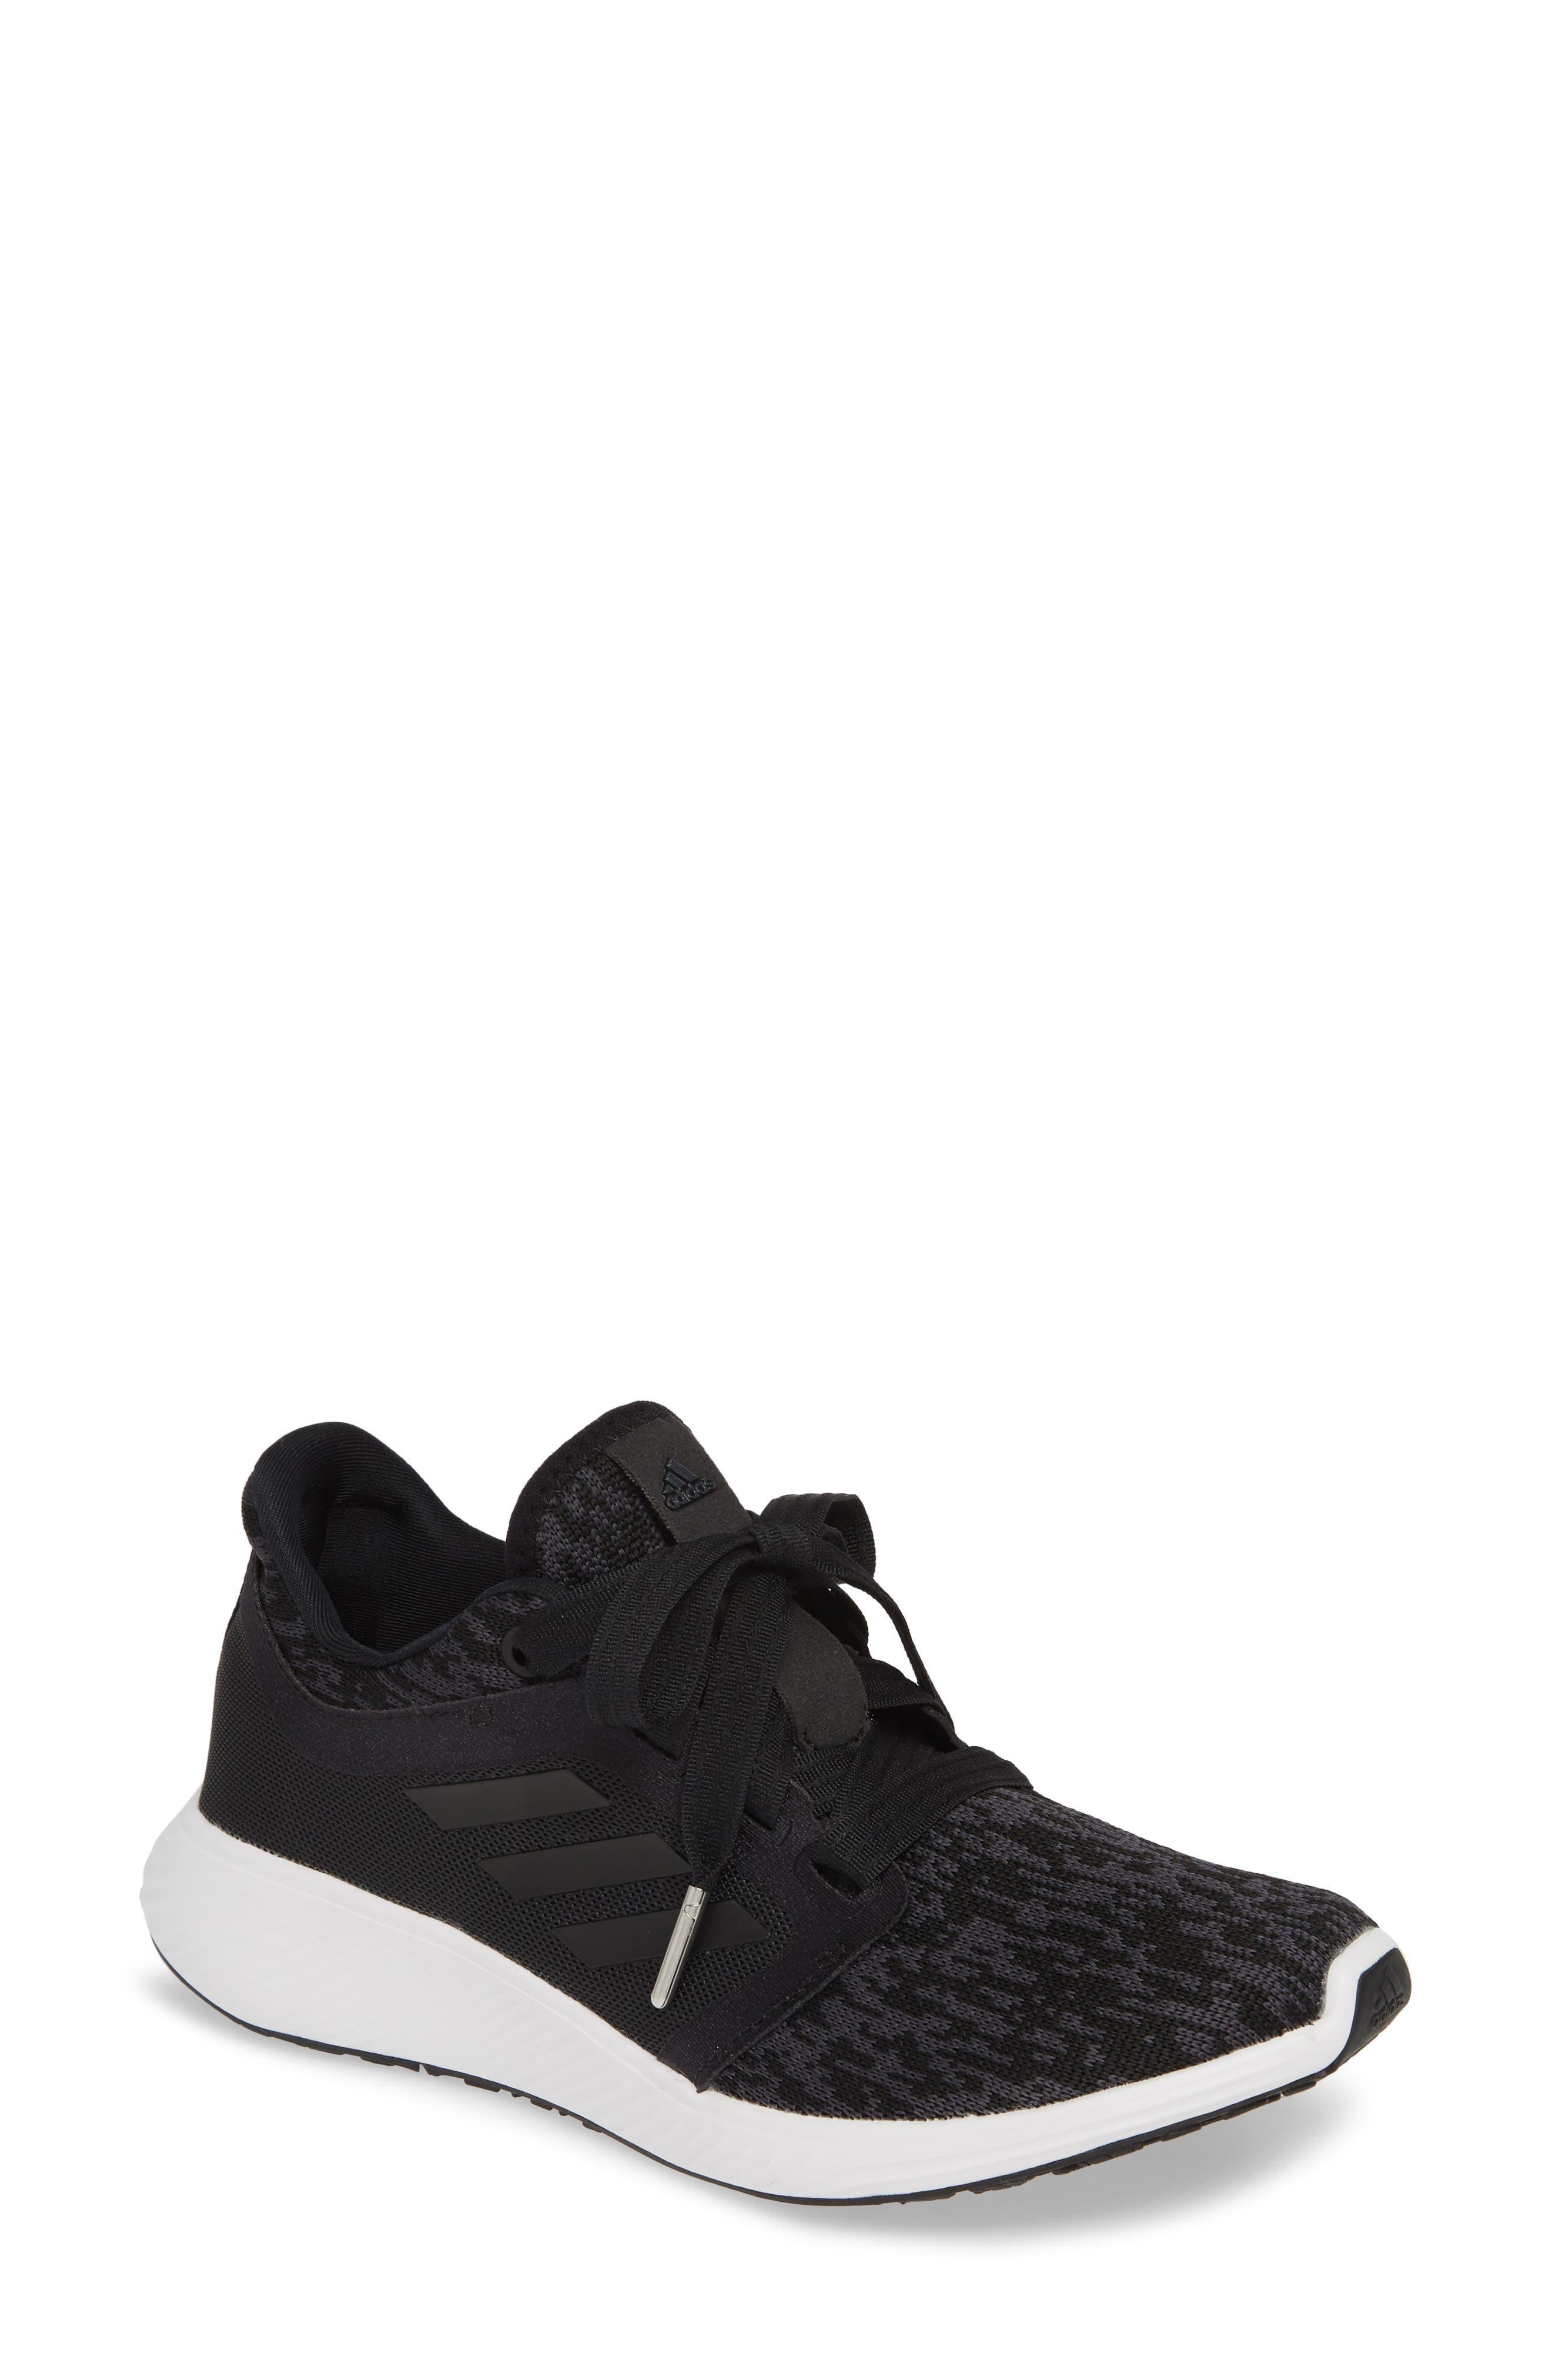 ADIDAS, Edge Lux 3 Running Shoe, Main thumbnail 1, color, CORE BLACK/ WHITE